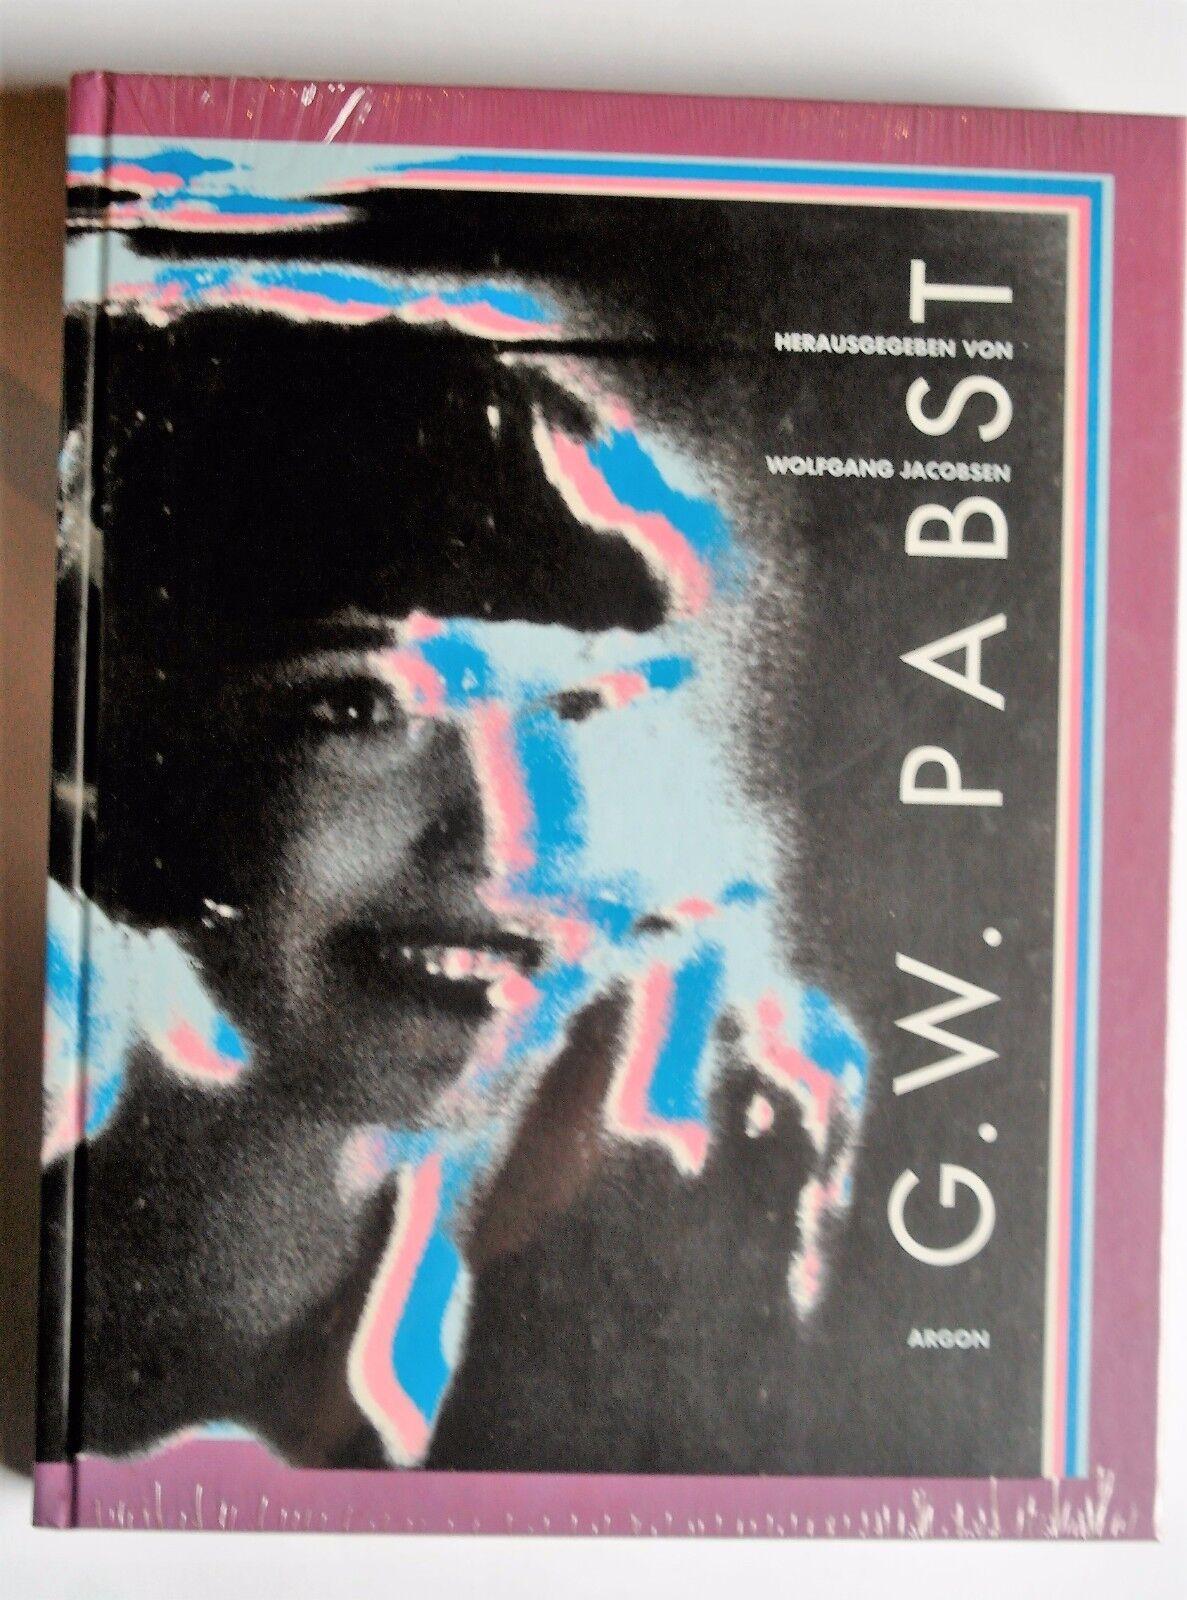 R3G026 G. W. Pabst - Gebundene Ausgabe 1997 von Wolfgang Jacobsen  OVP - Wolfgang Jacobsen